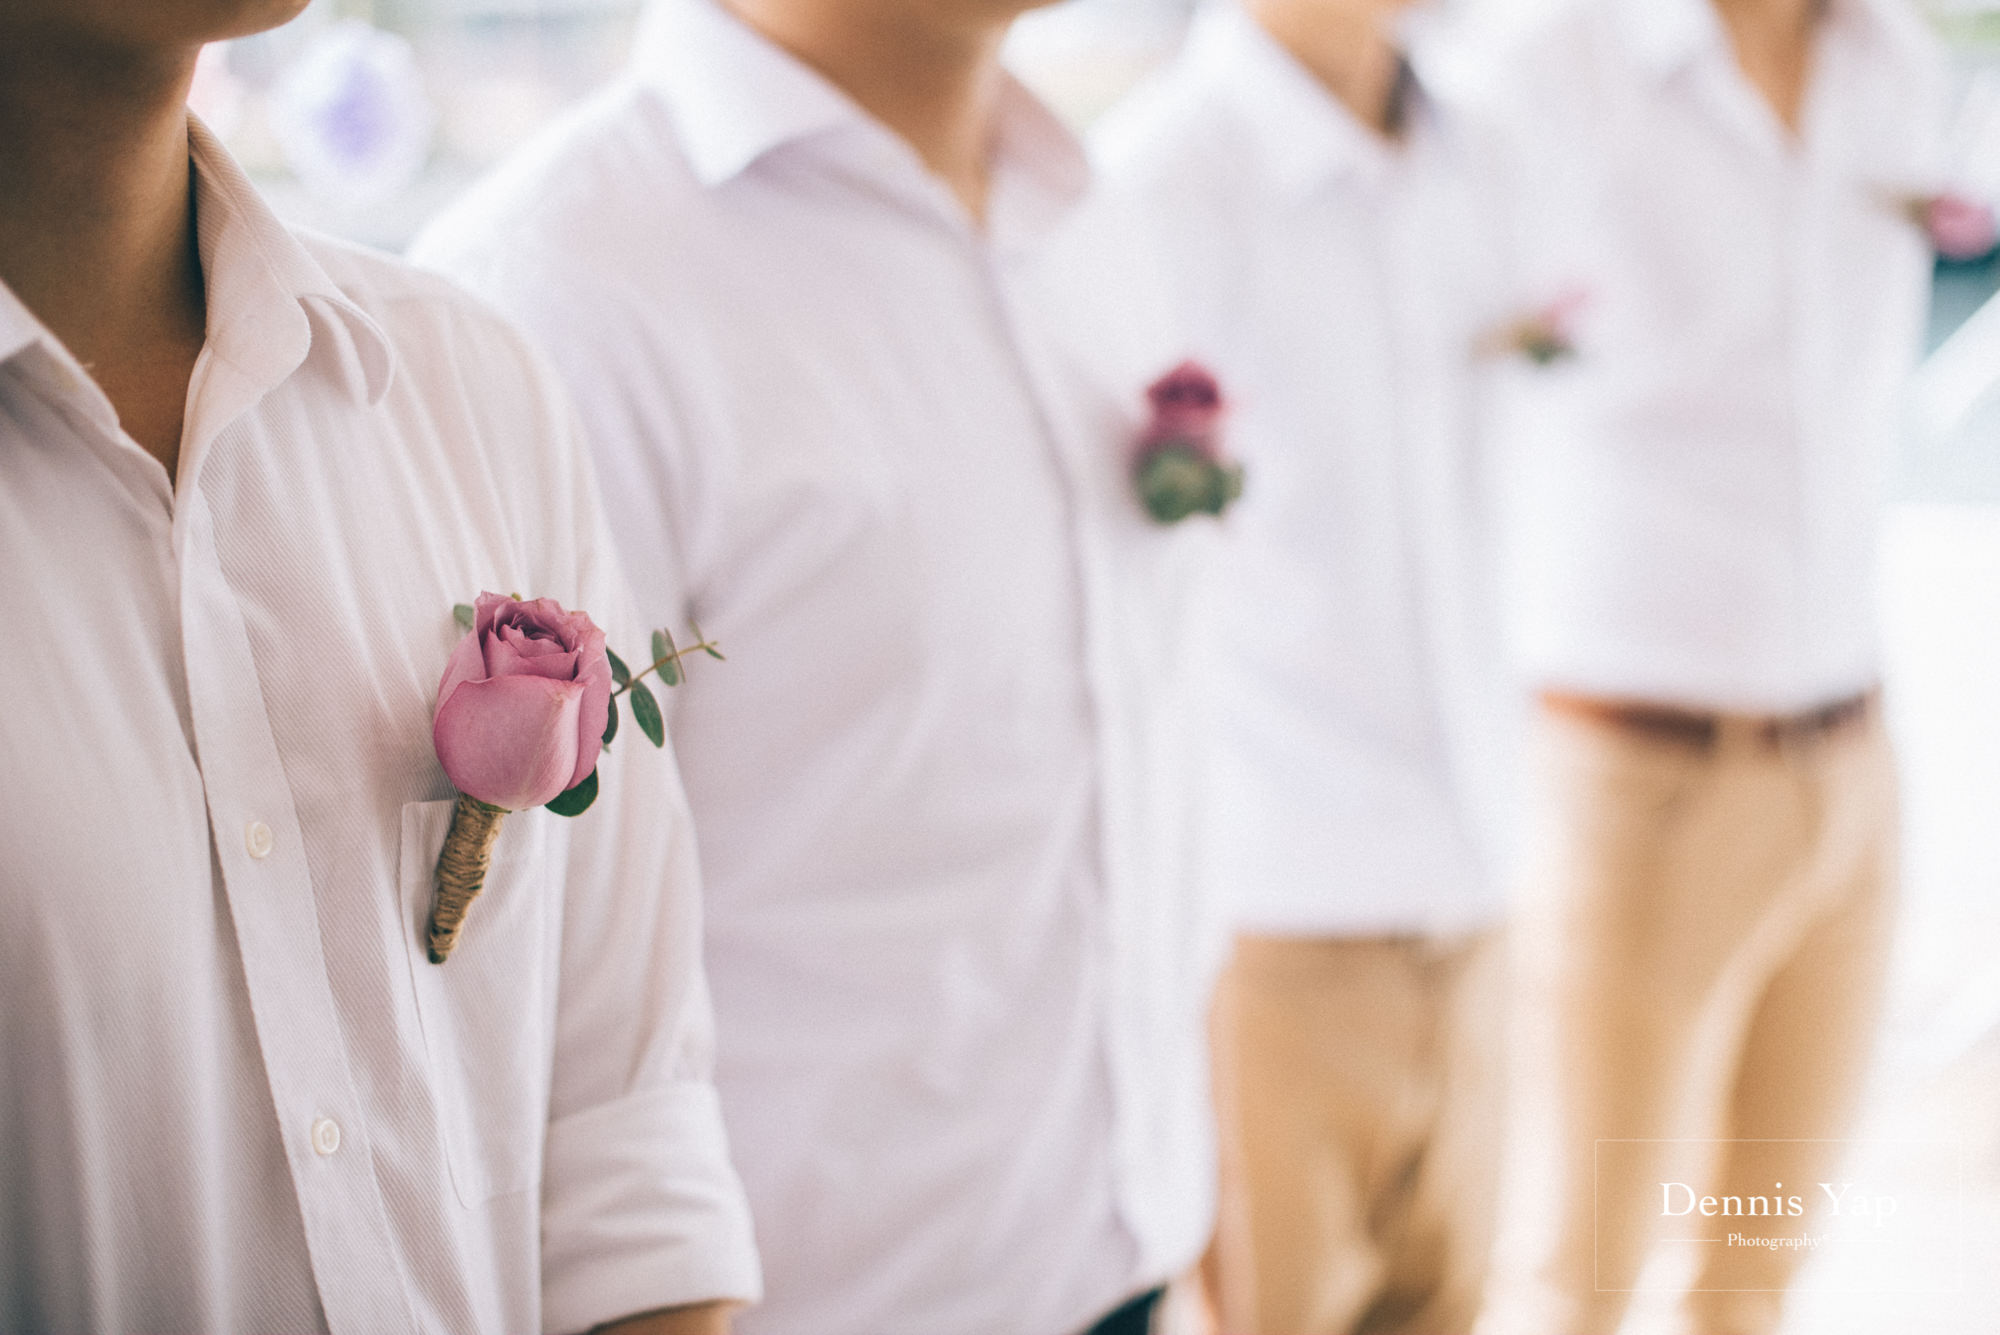 danny sherine wedding reception registration of marriage yacht fun beloved sea dennis yap photography malaysia top wedding photographer-18.jpg